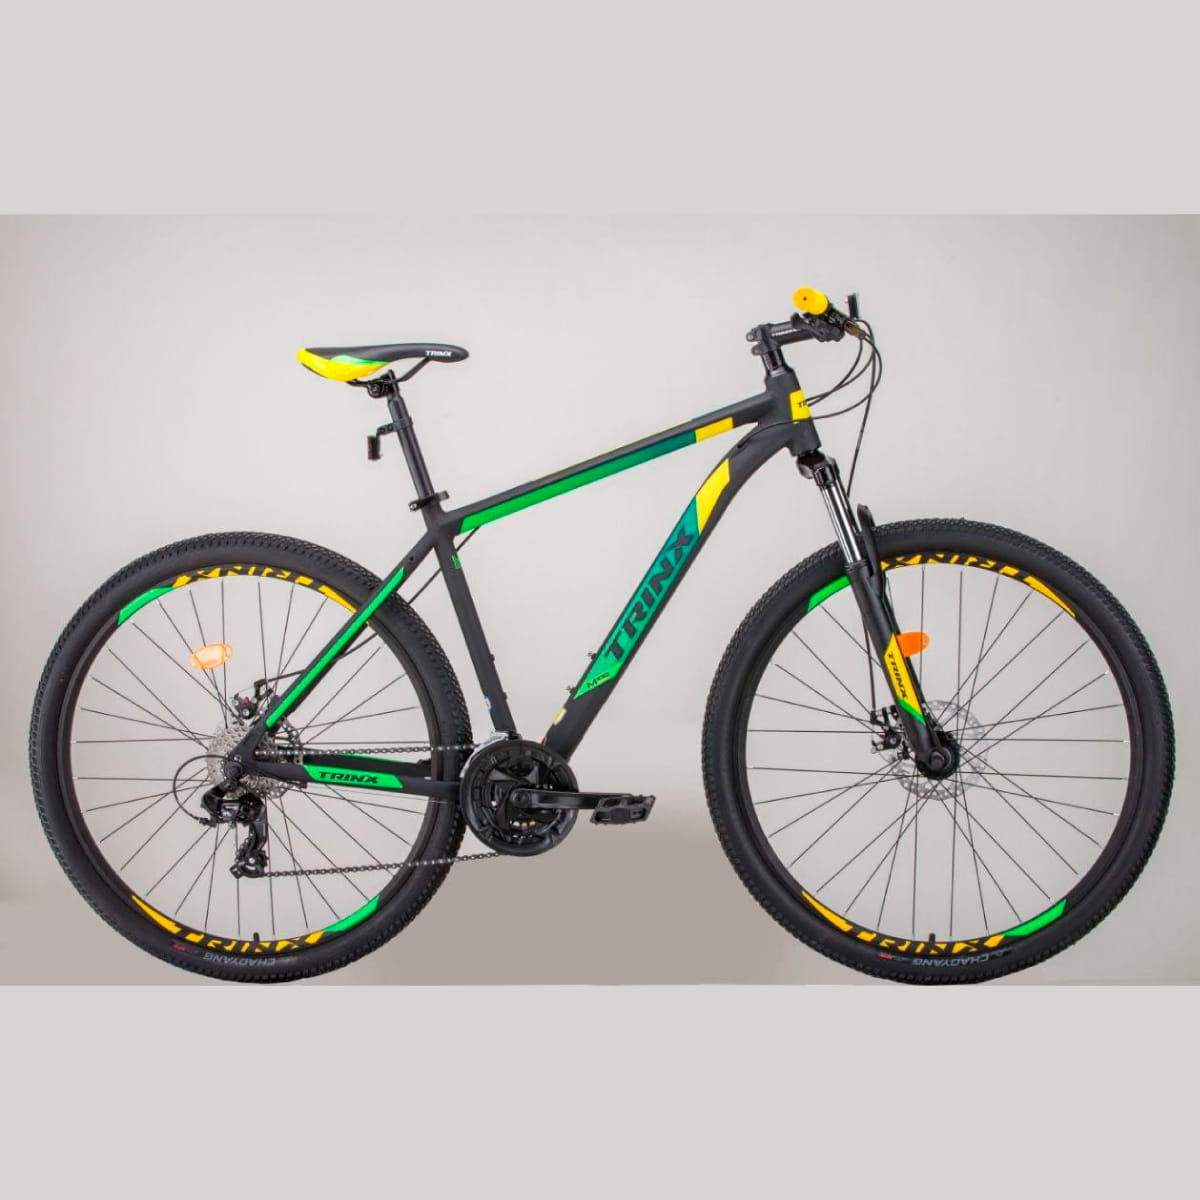 Bike Trinx M100 Max 2020 24v Shimano Verde Amarela